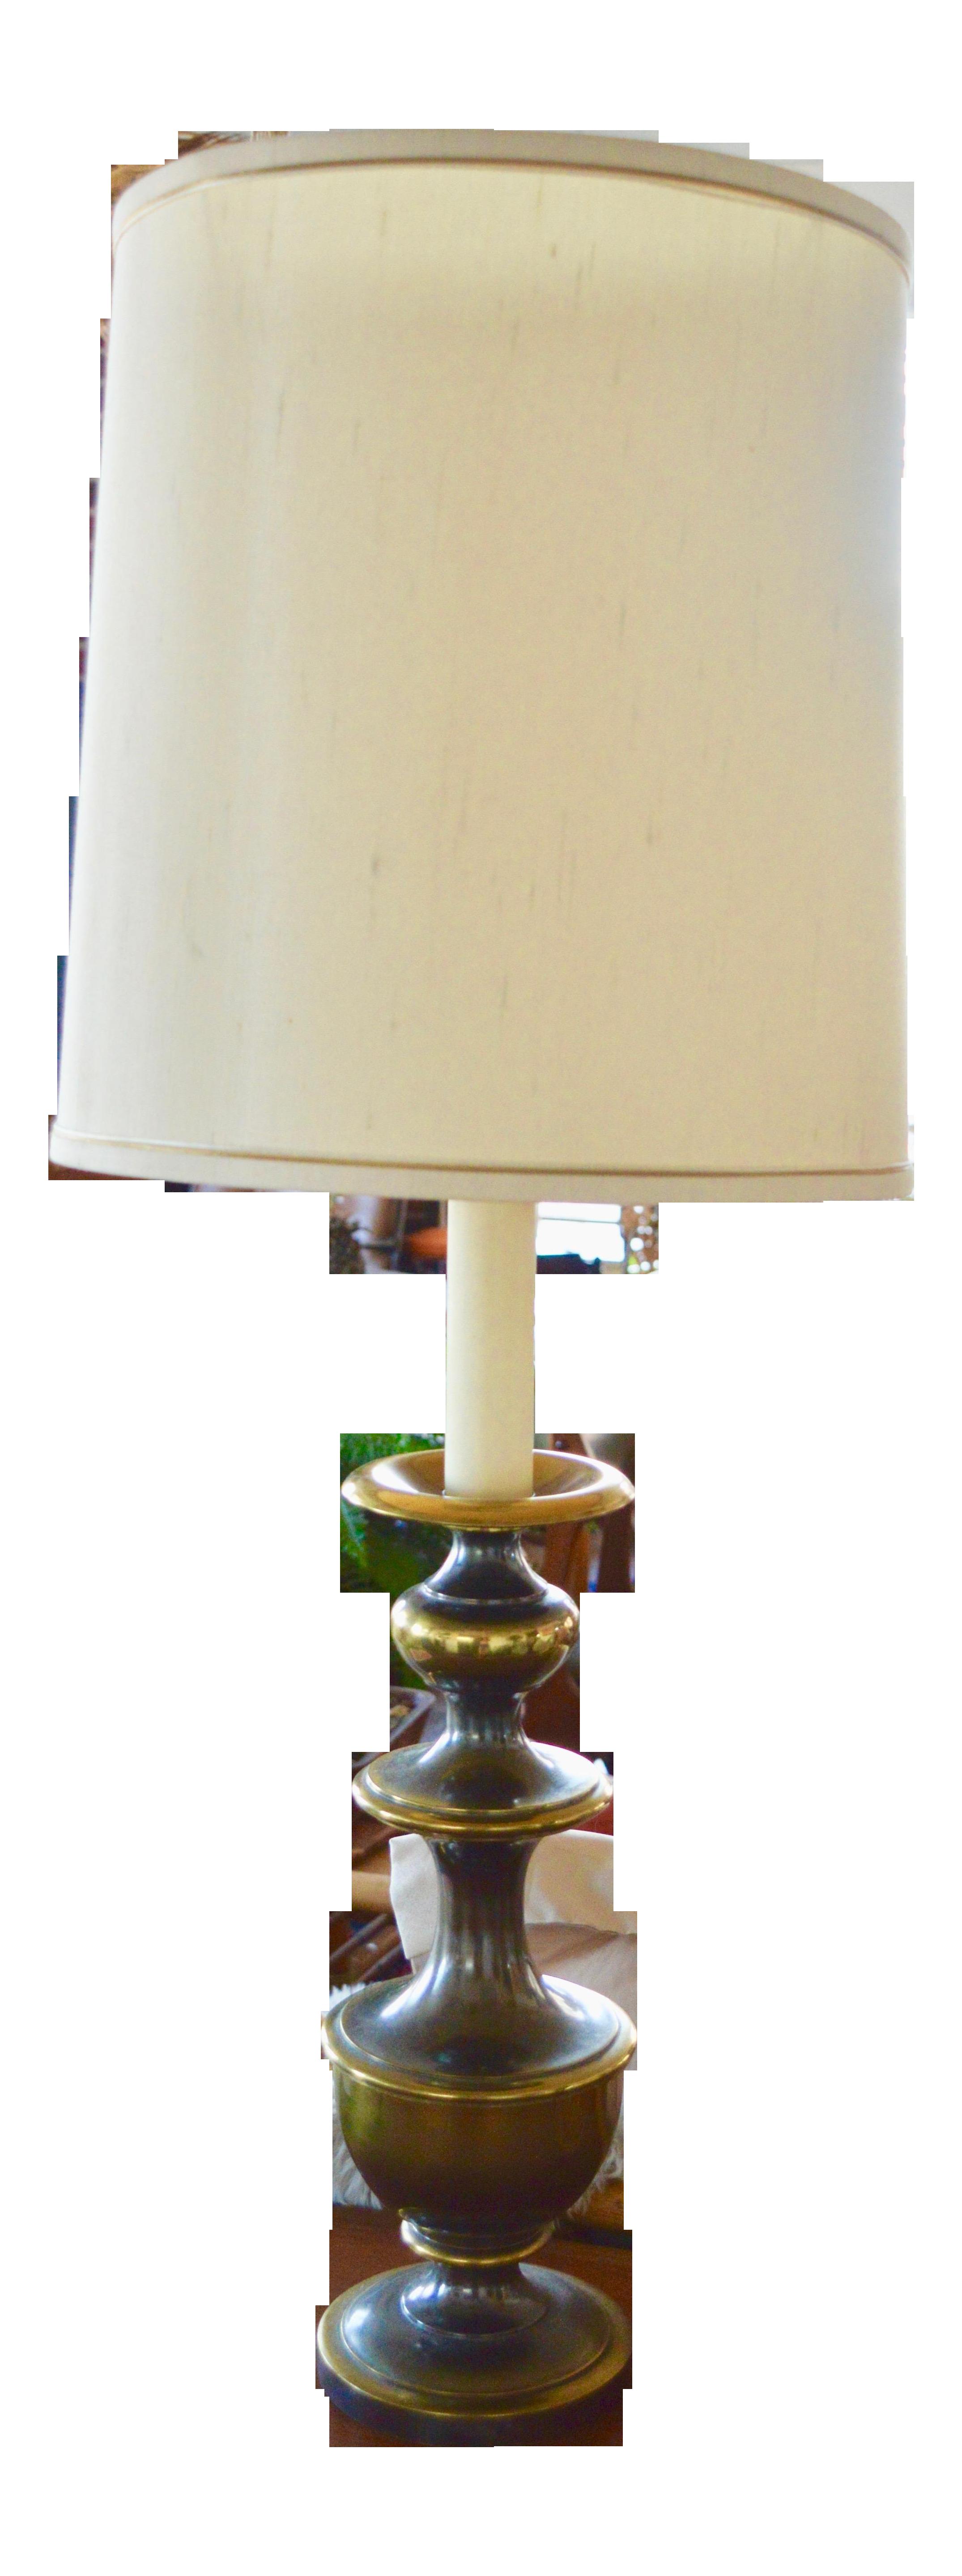 Leviton Olive Green Bronze Candlestick Table Lamp Chairish